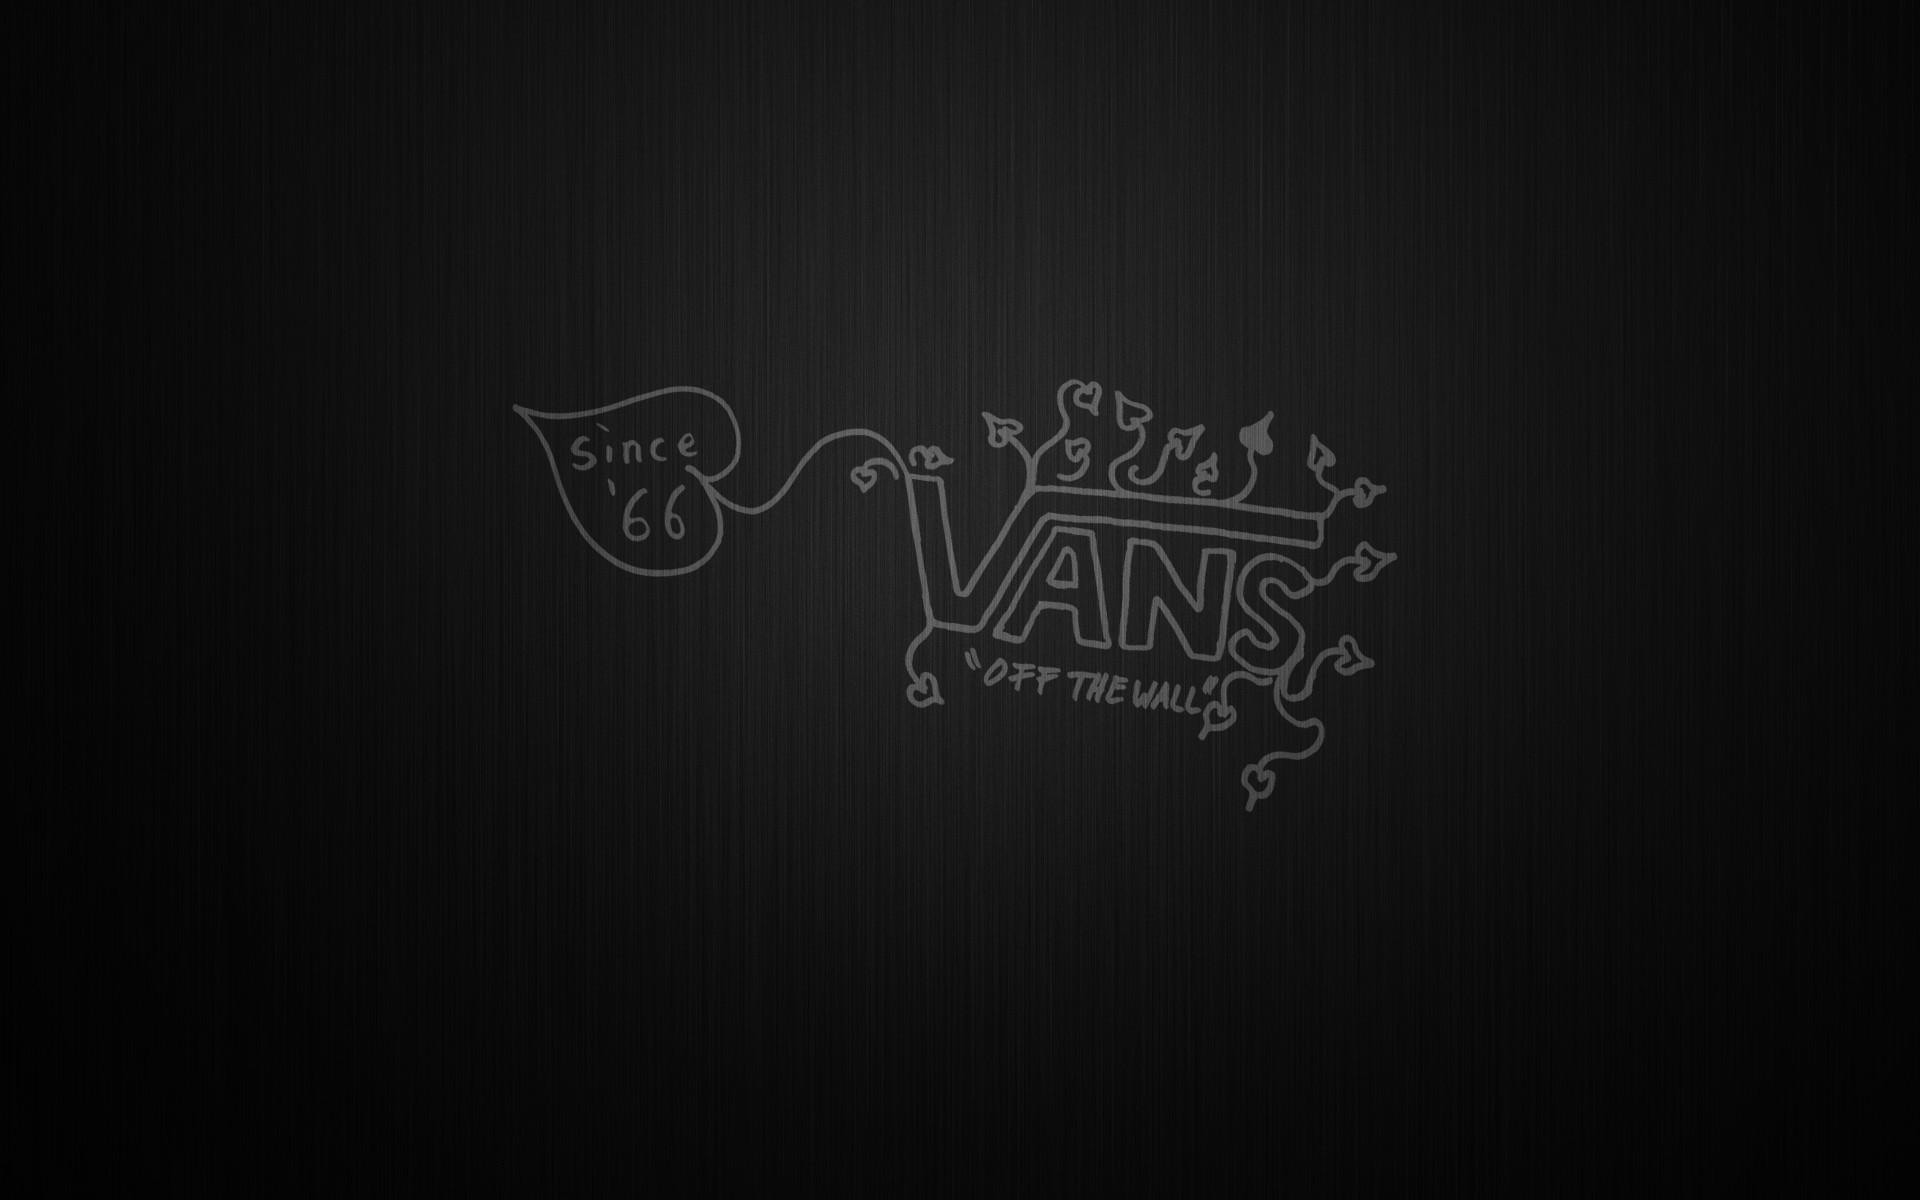 vans logo wallpaper 183��